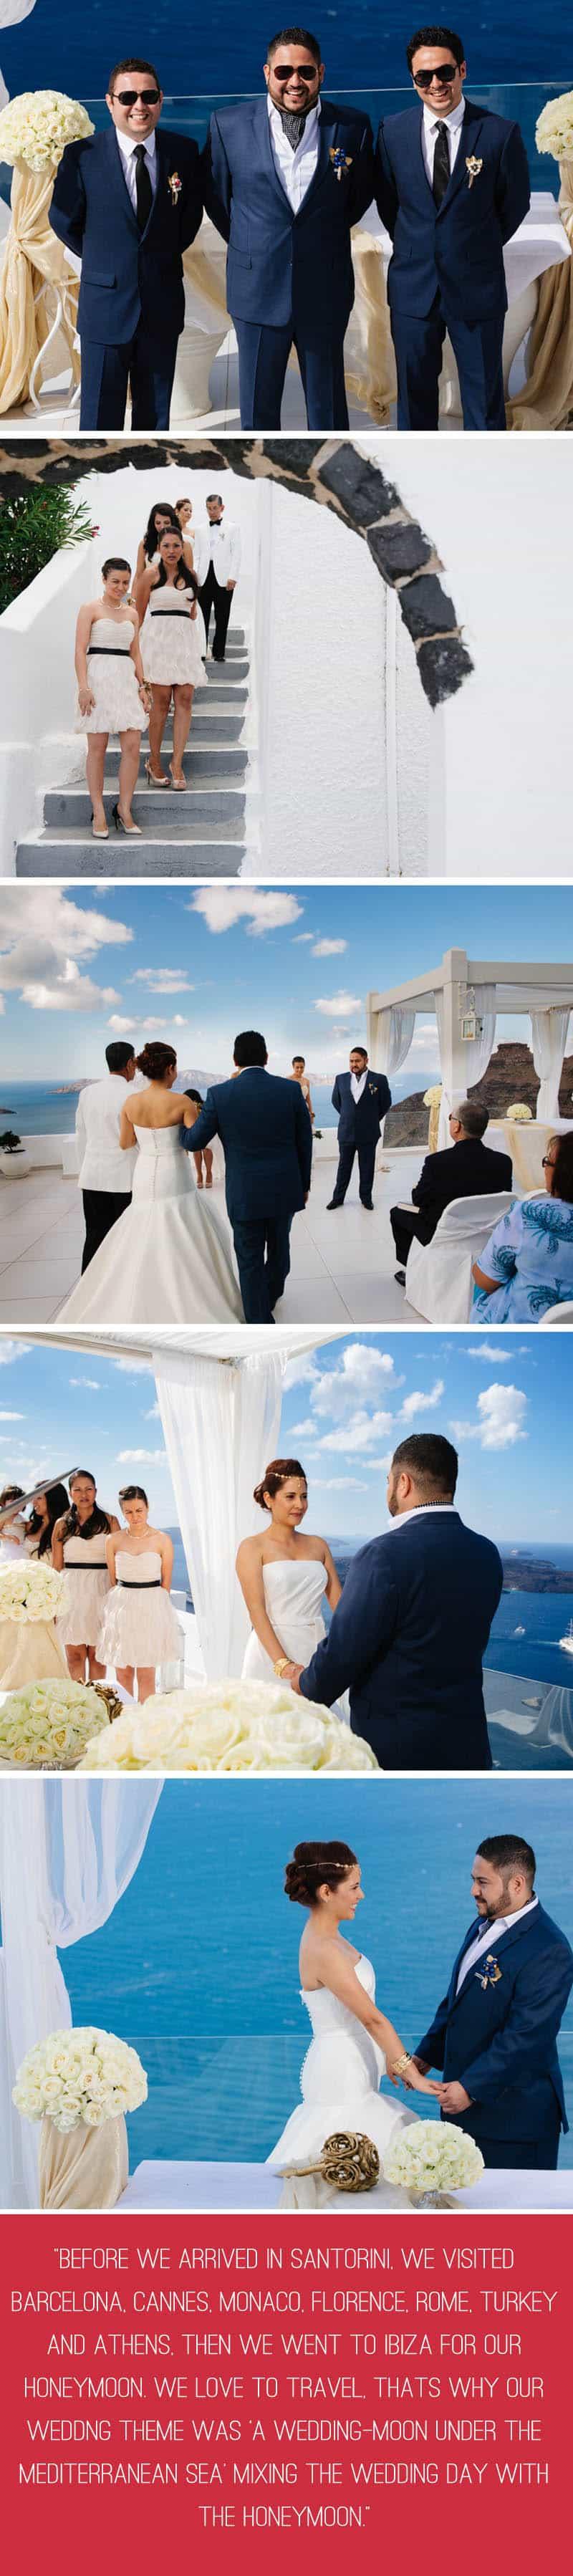 A Travel Themed Destination Wedding in Santorini 3